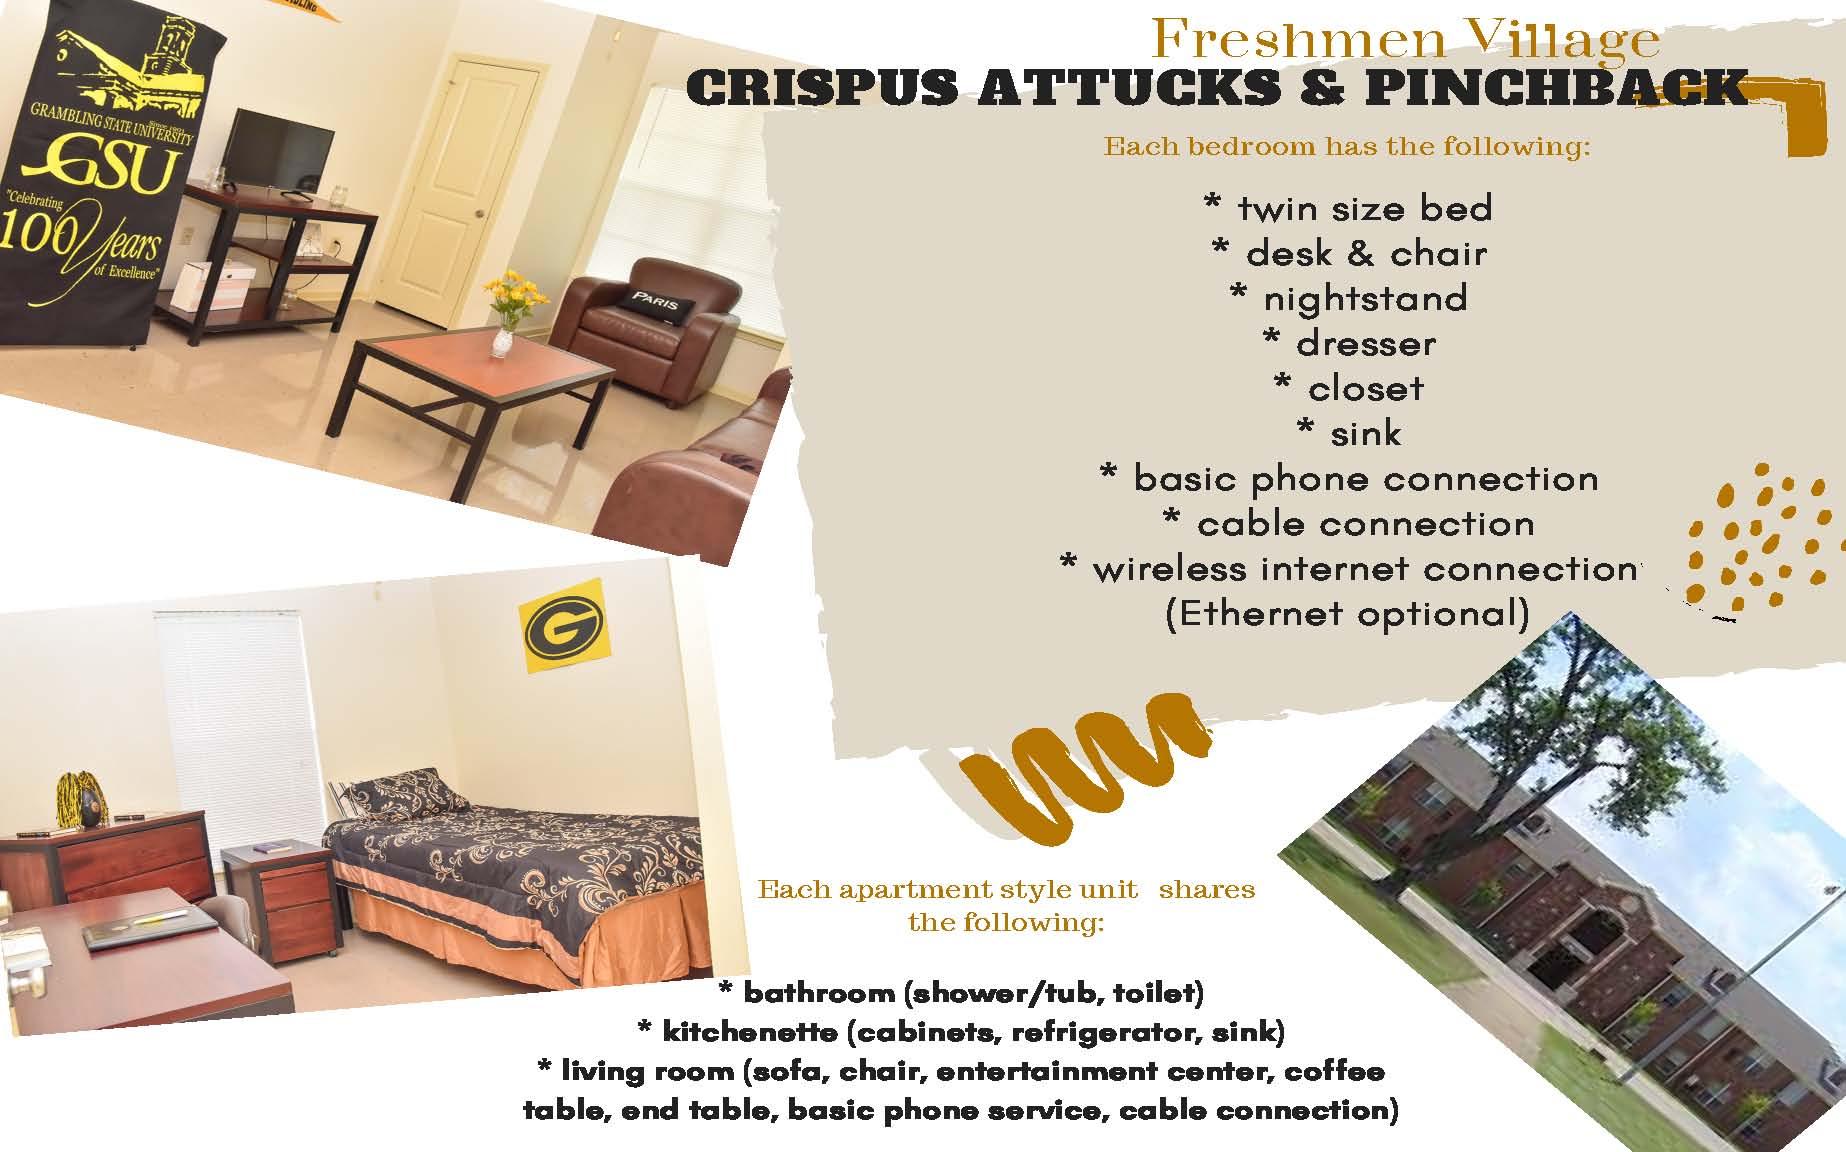 Freshmen Village - Crispus Attucks & Pinchback